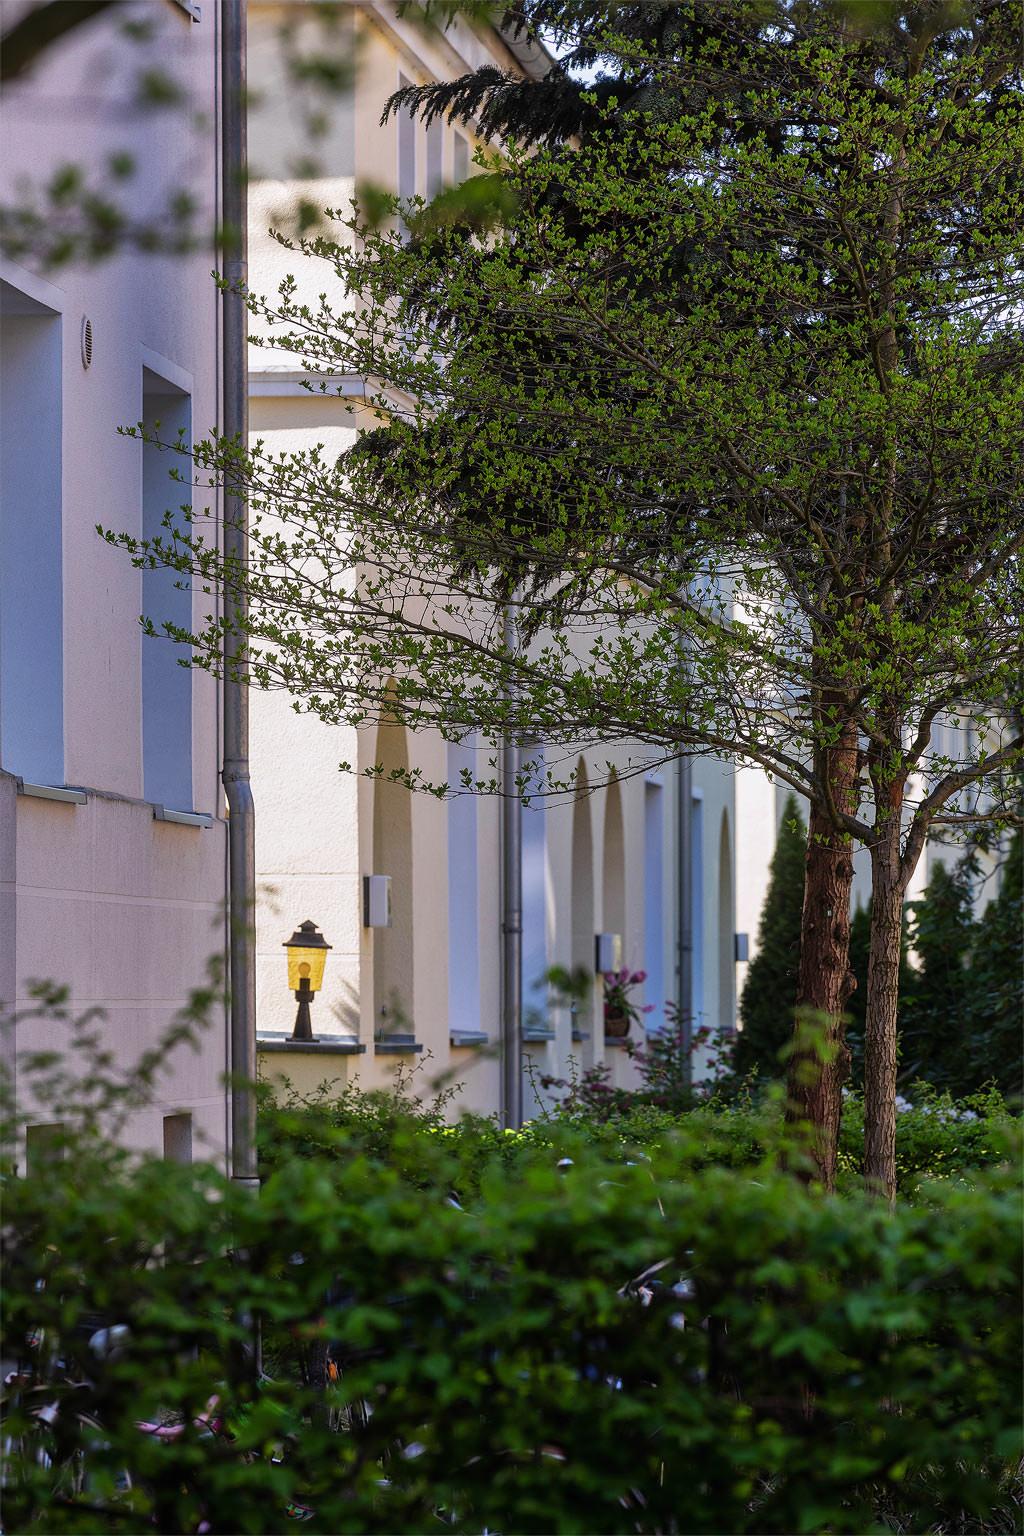 Häuserzeile der Baugenossenschaft Fuhlsbüttel © Hermann Jansen